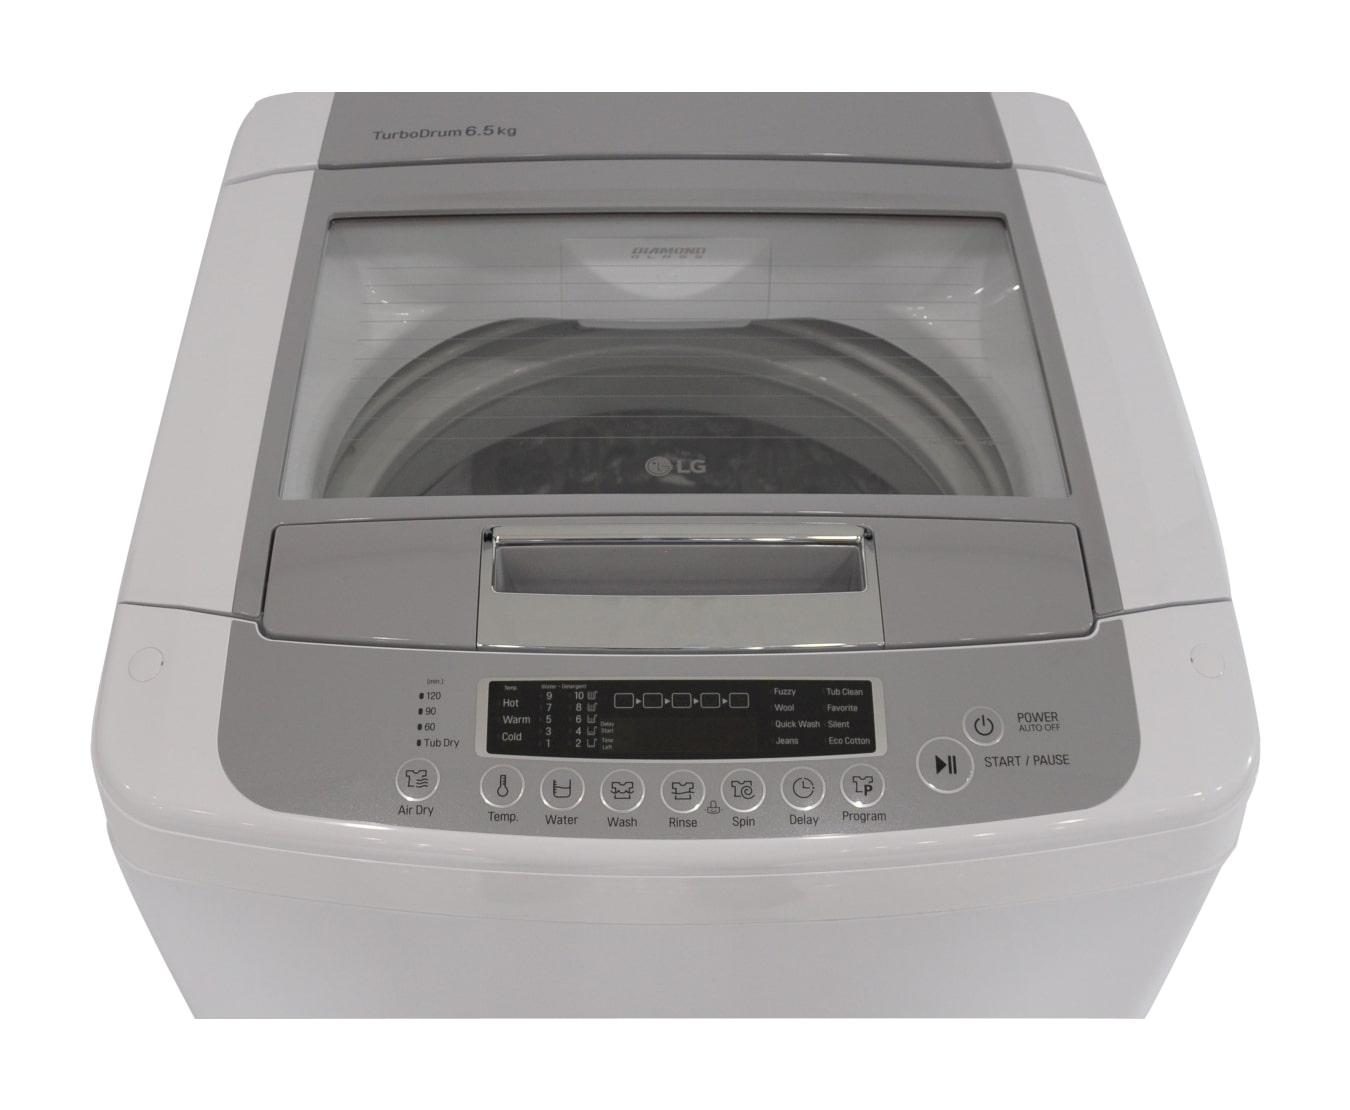 LG Top Load Washing Machines | WF-T8582 Top Loader | LG